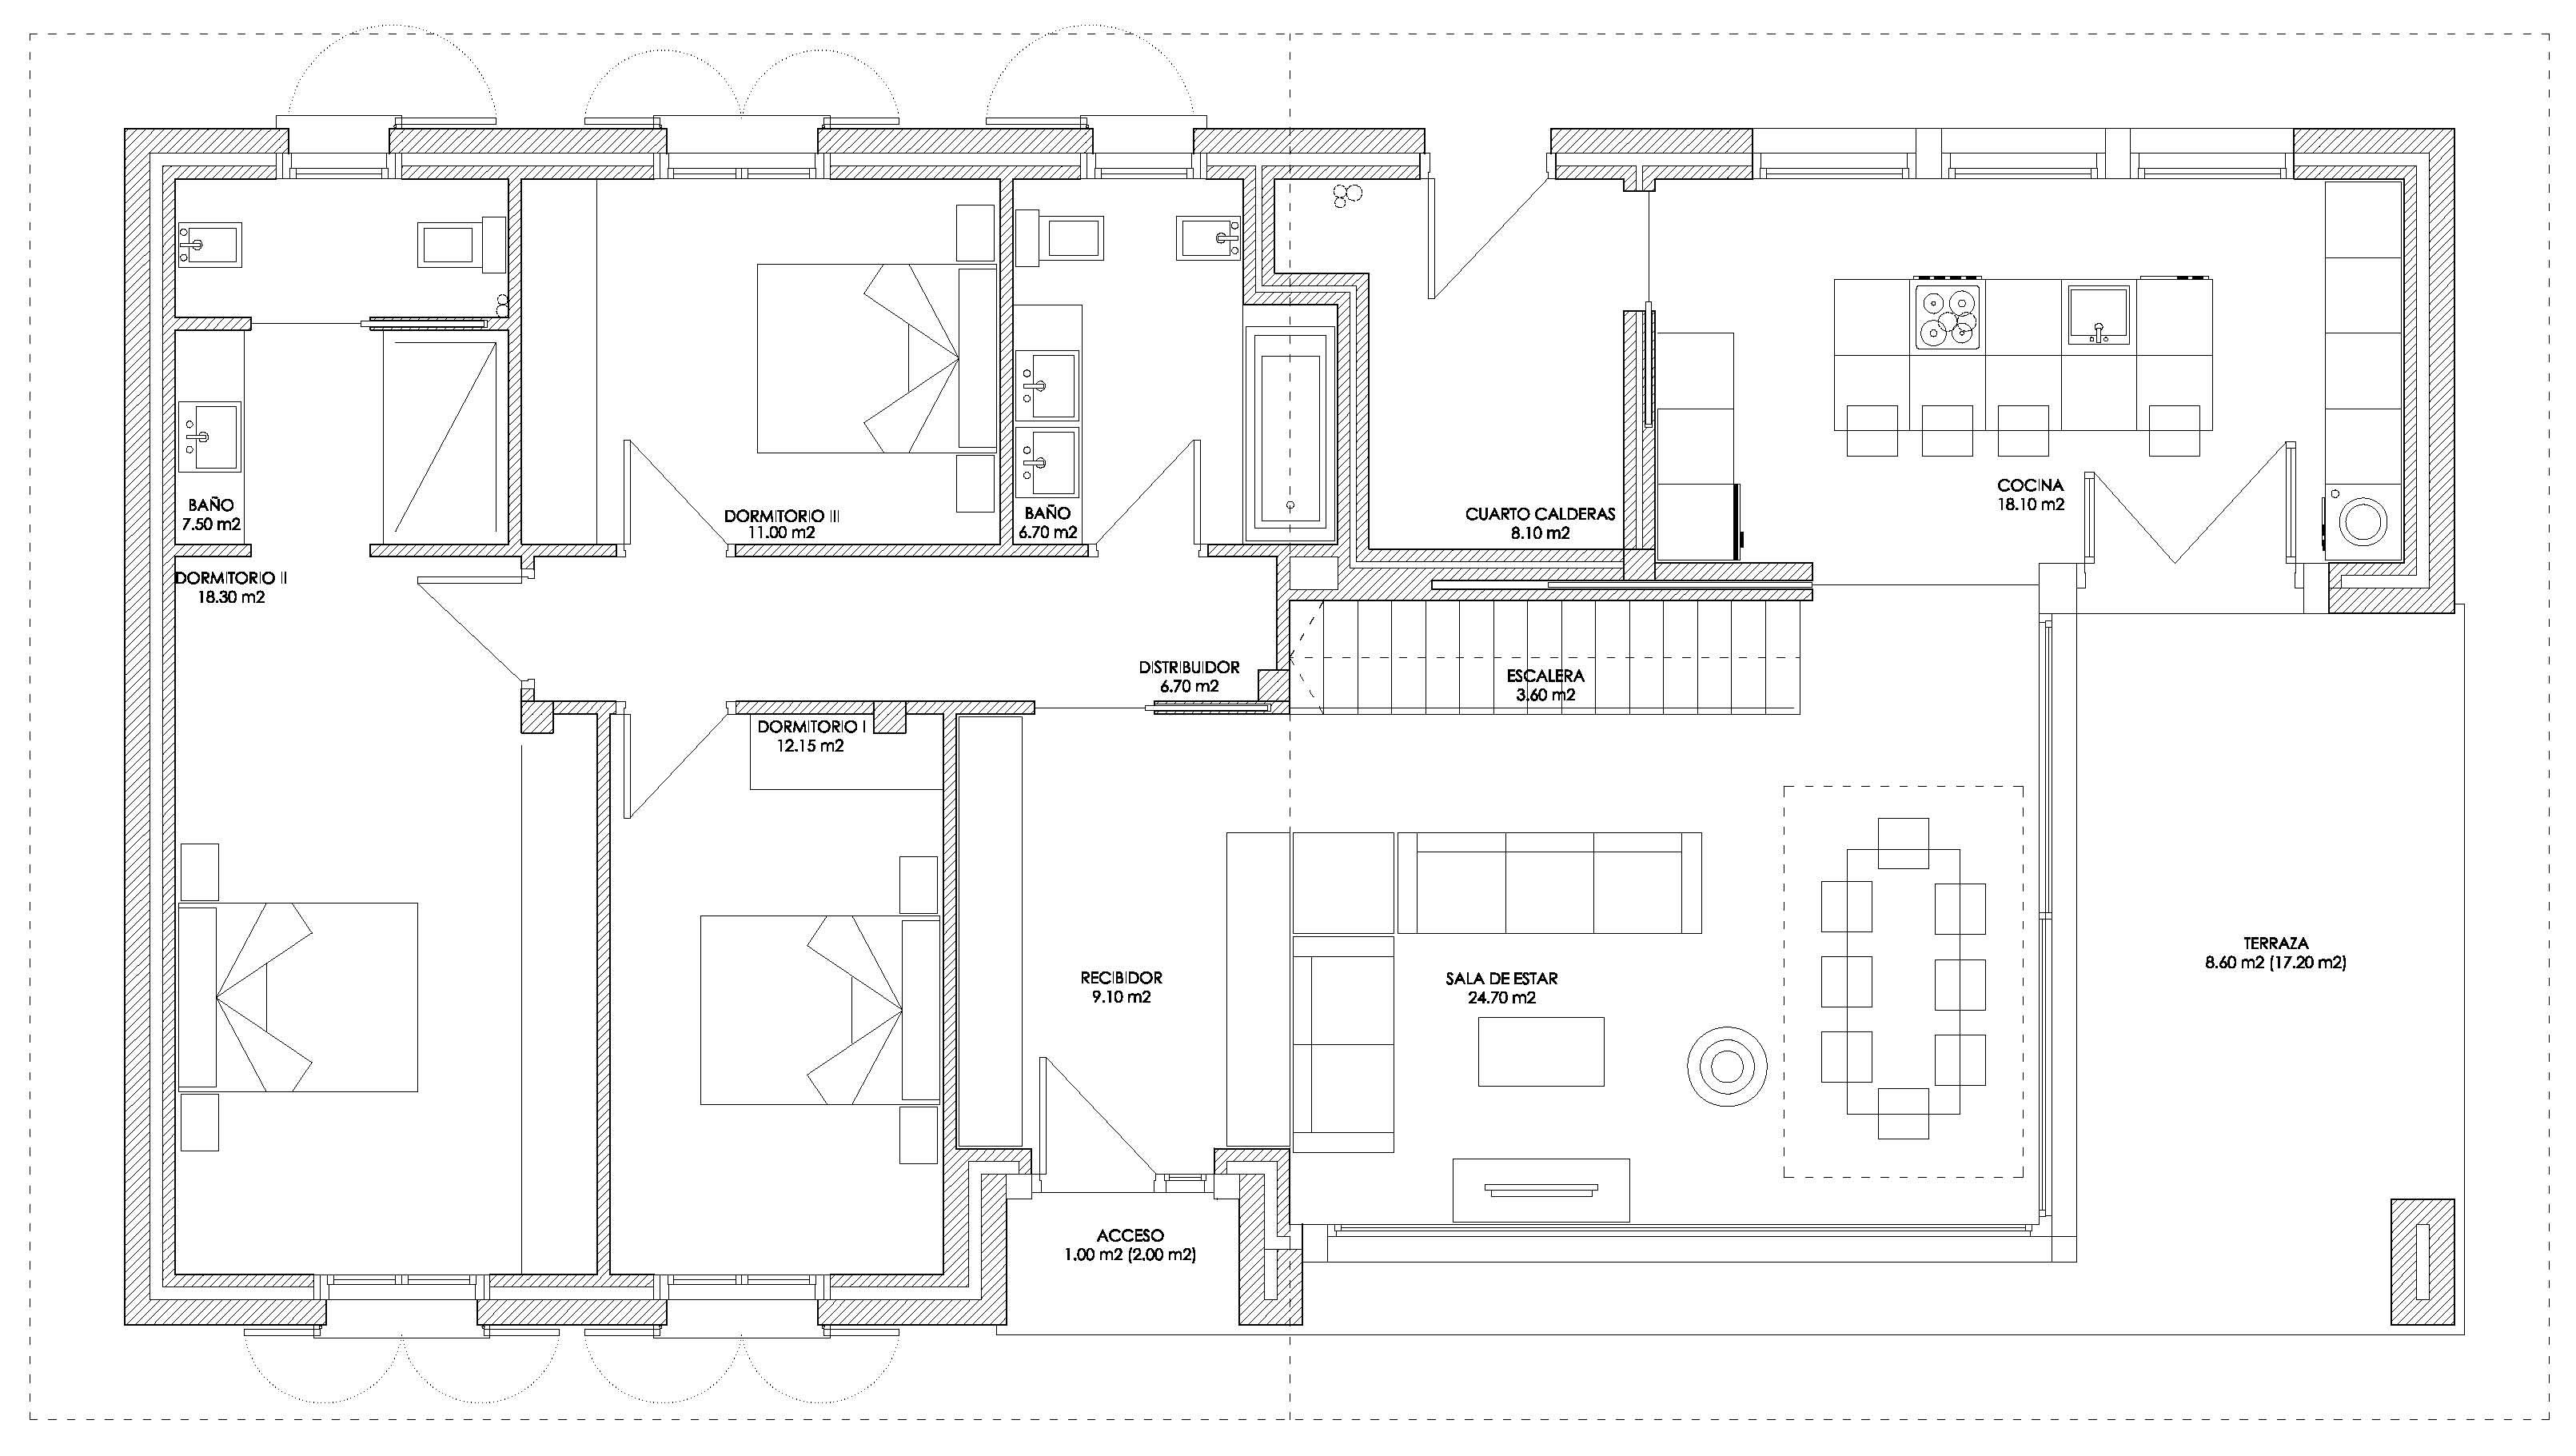 Linoplaza arquitectura vivienda unifamiliar en aniz for Planos de viviendas unifamiliares